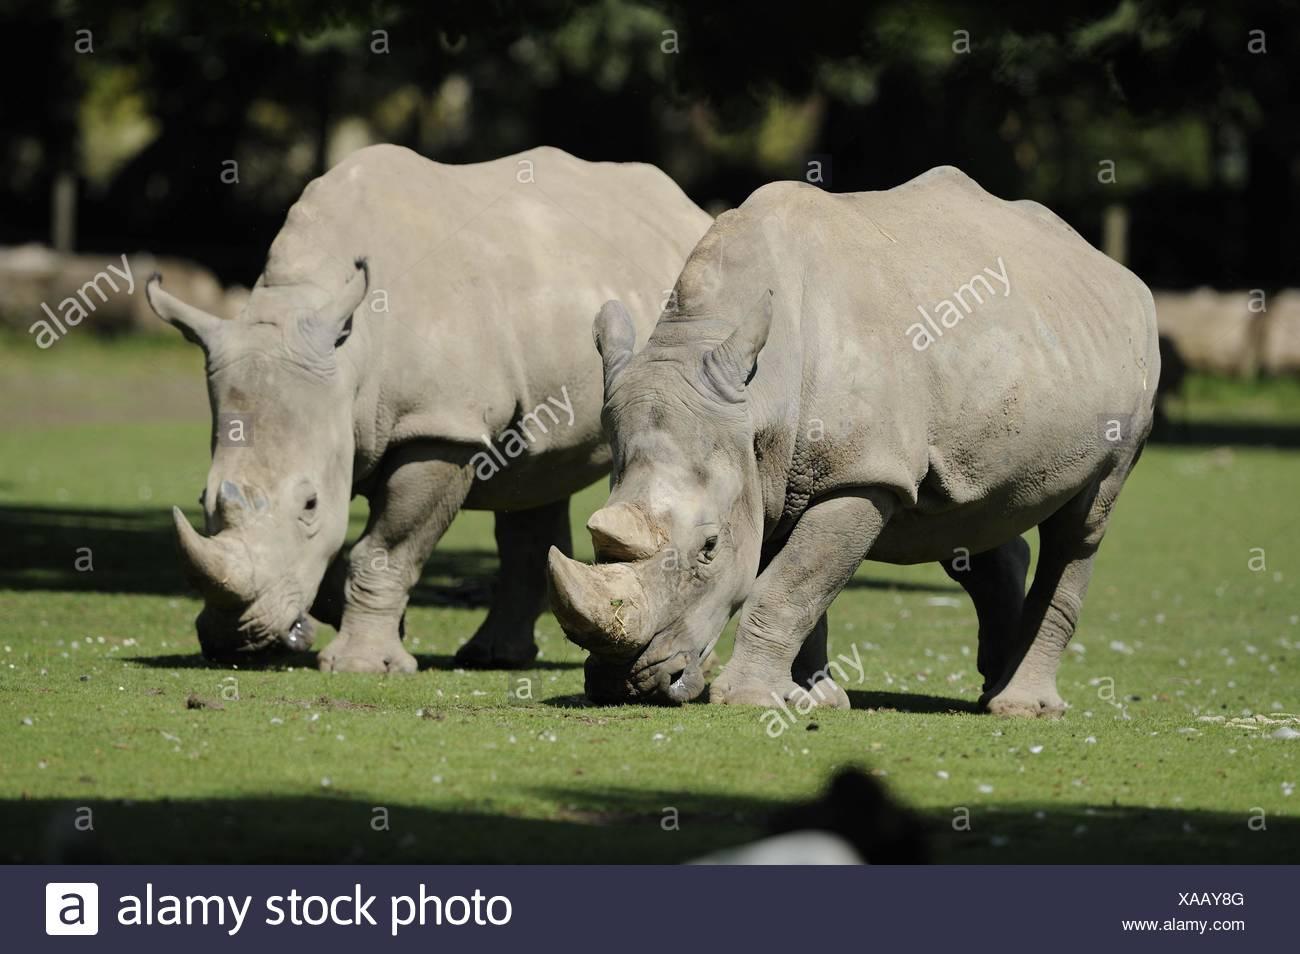 square-lipped rhinos - Stock Image